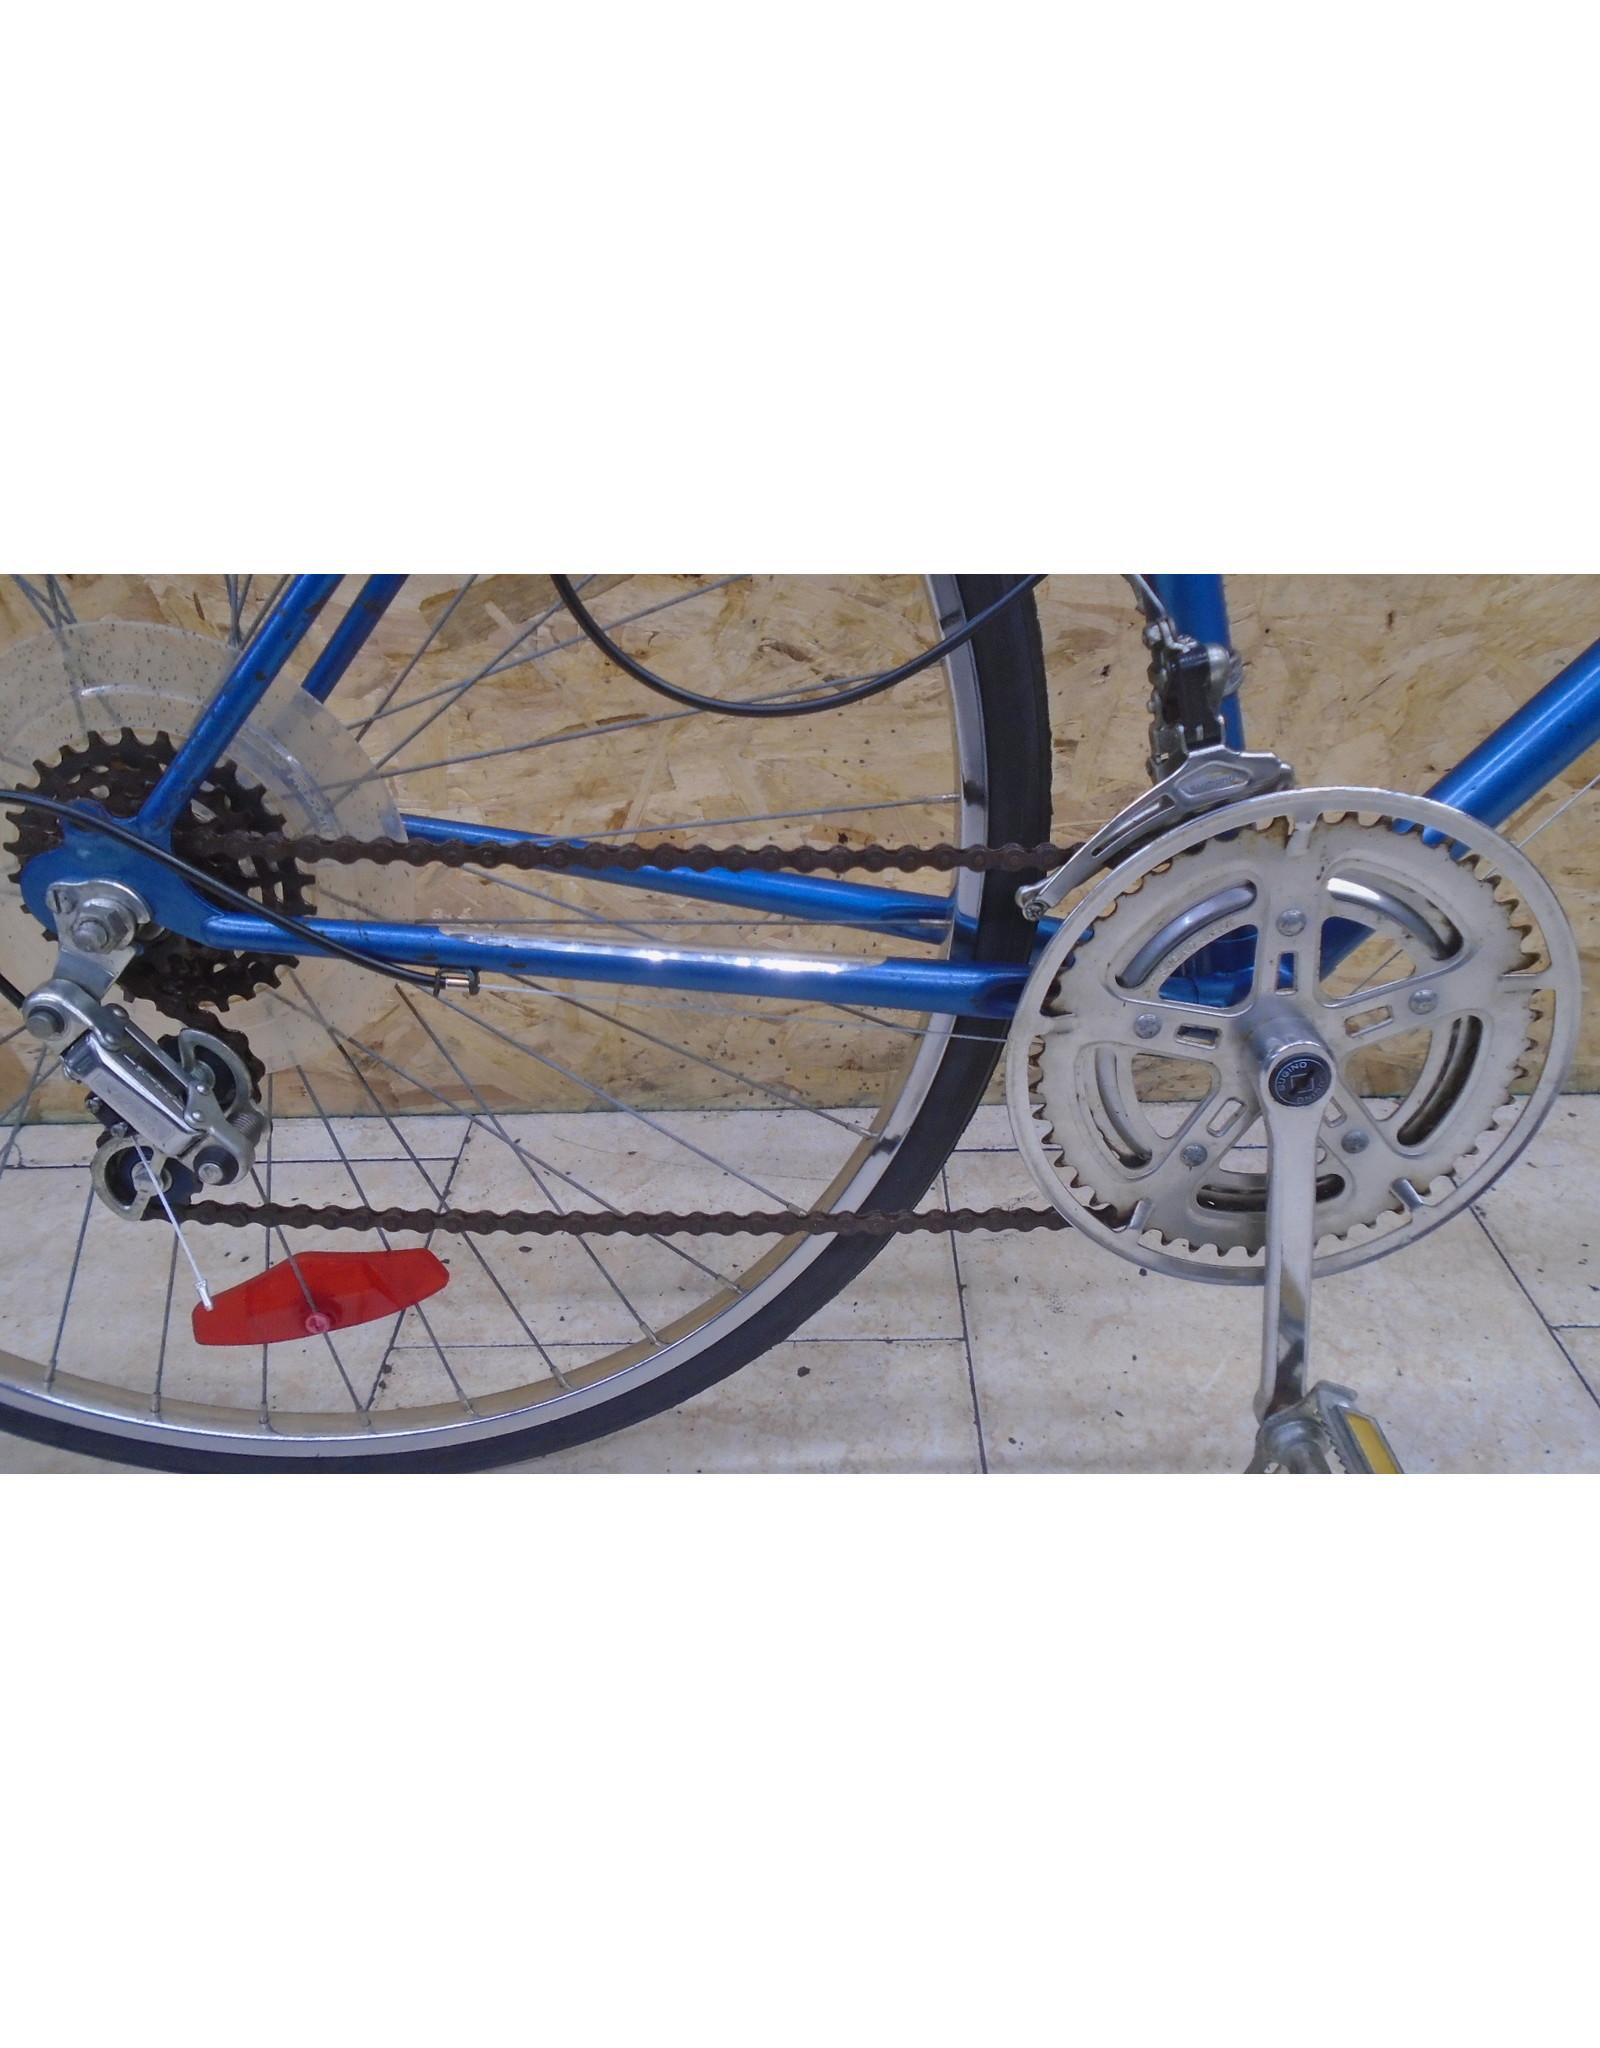 "Vélo usagé de route Free Spirit 19"" - 10135"